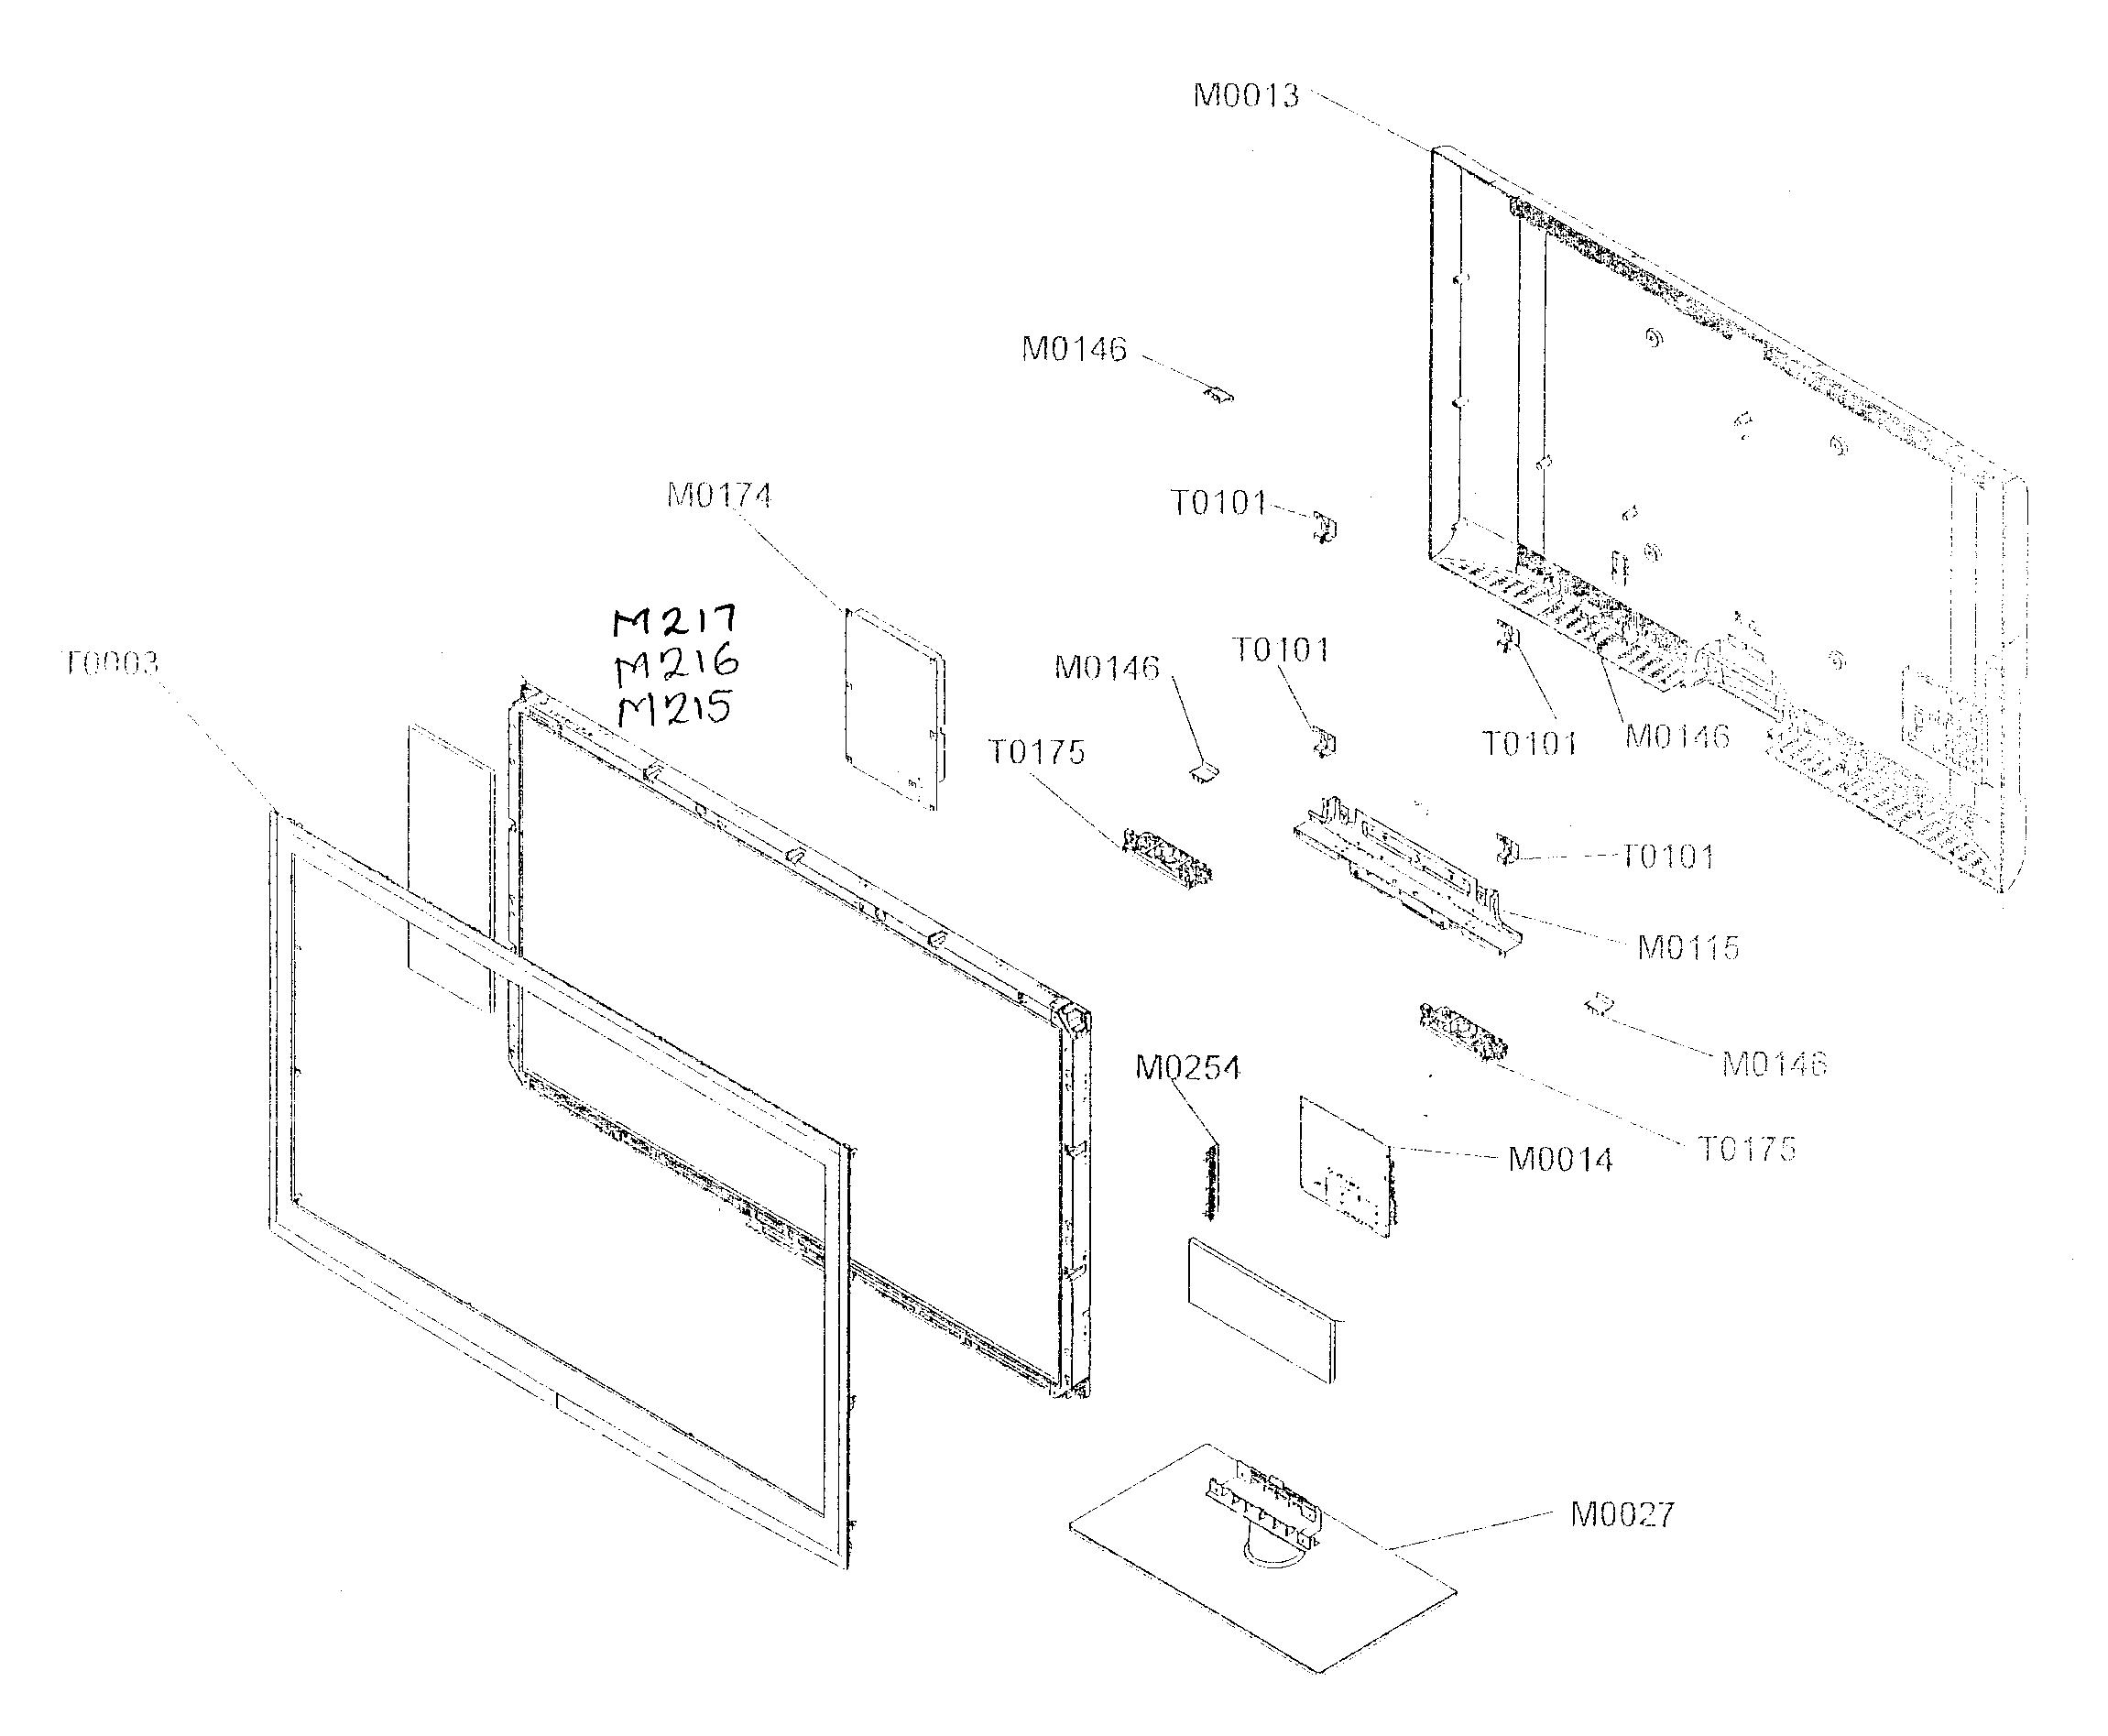 samsung schematic diagram for model ln t4061f